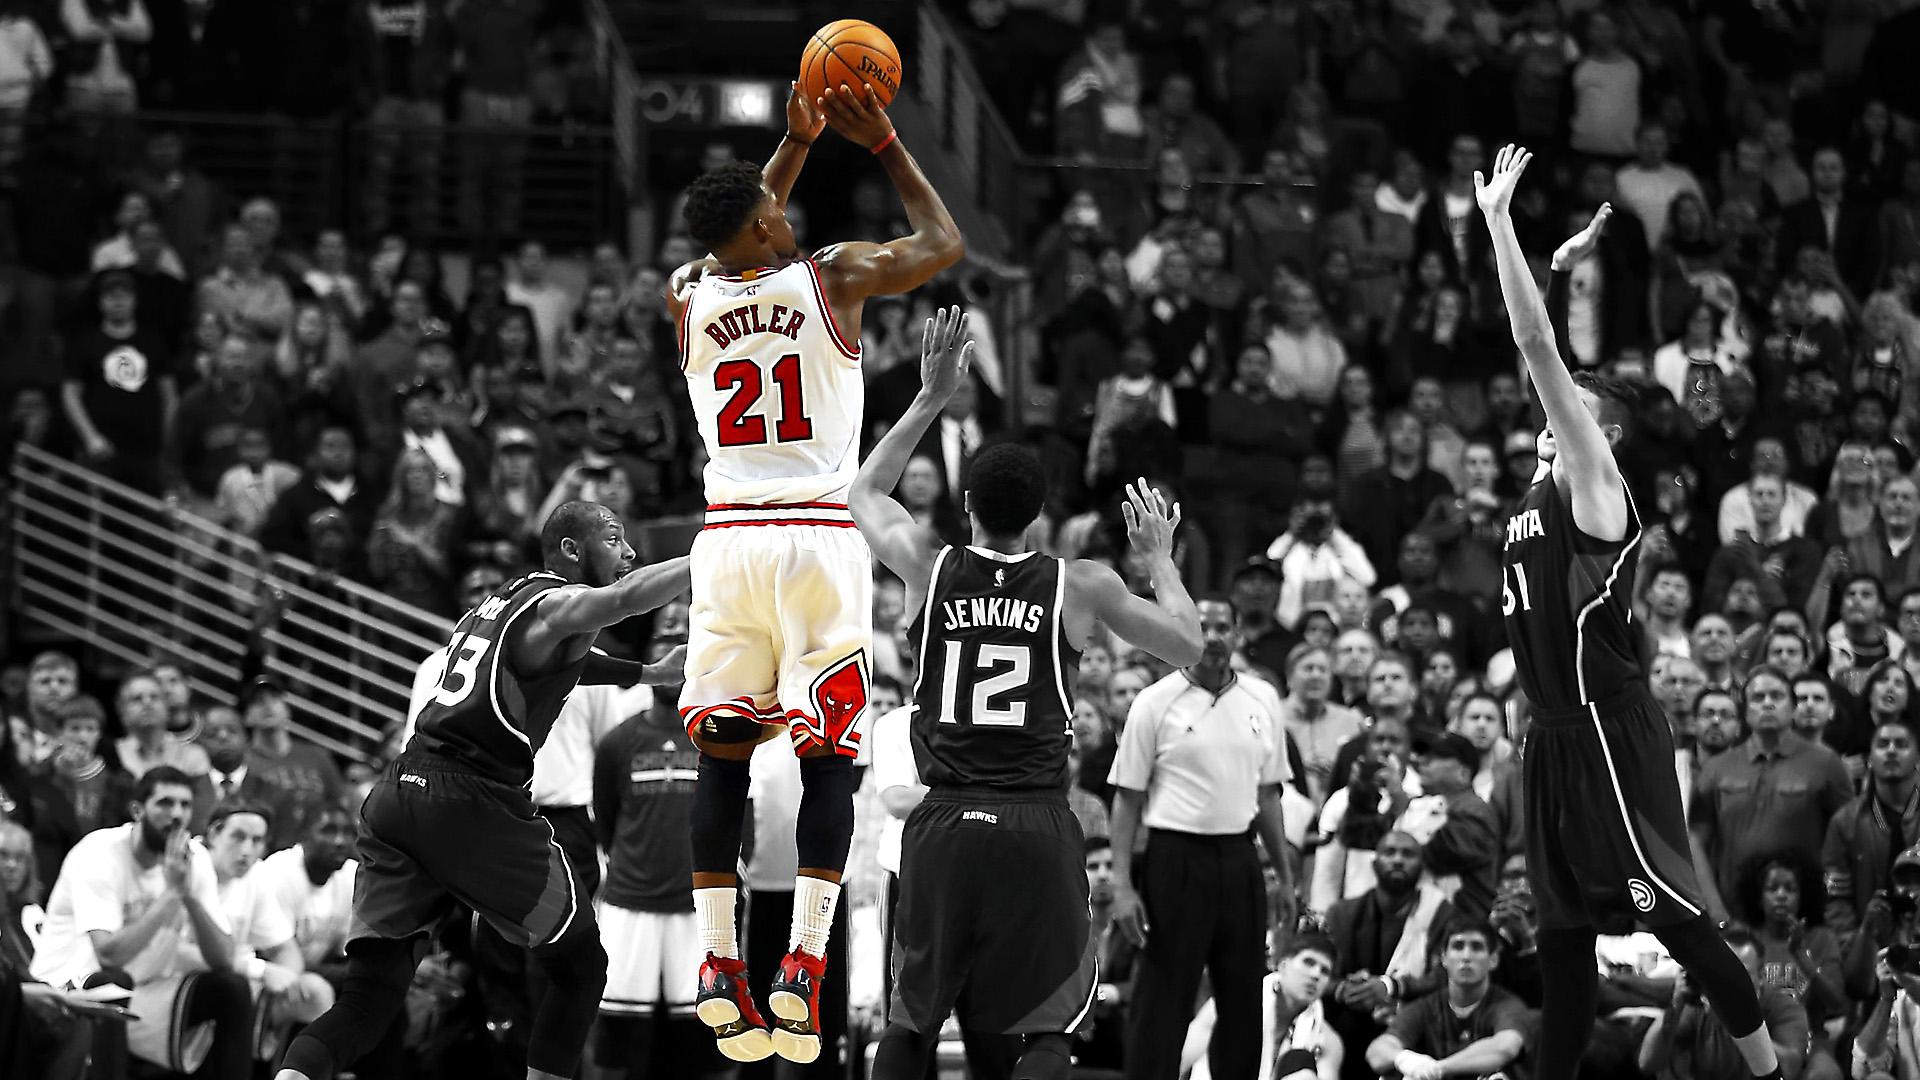 NBA Wallpapers HD